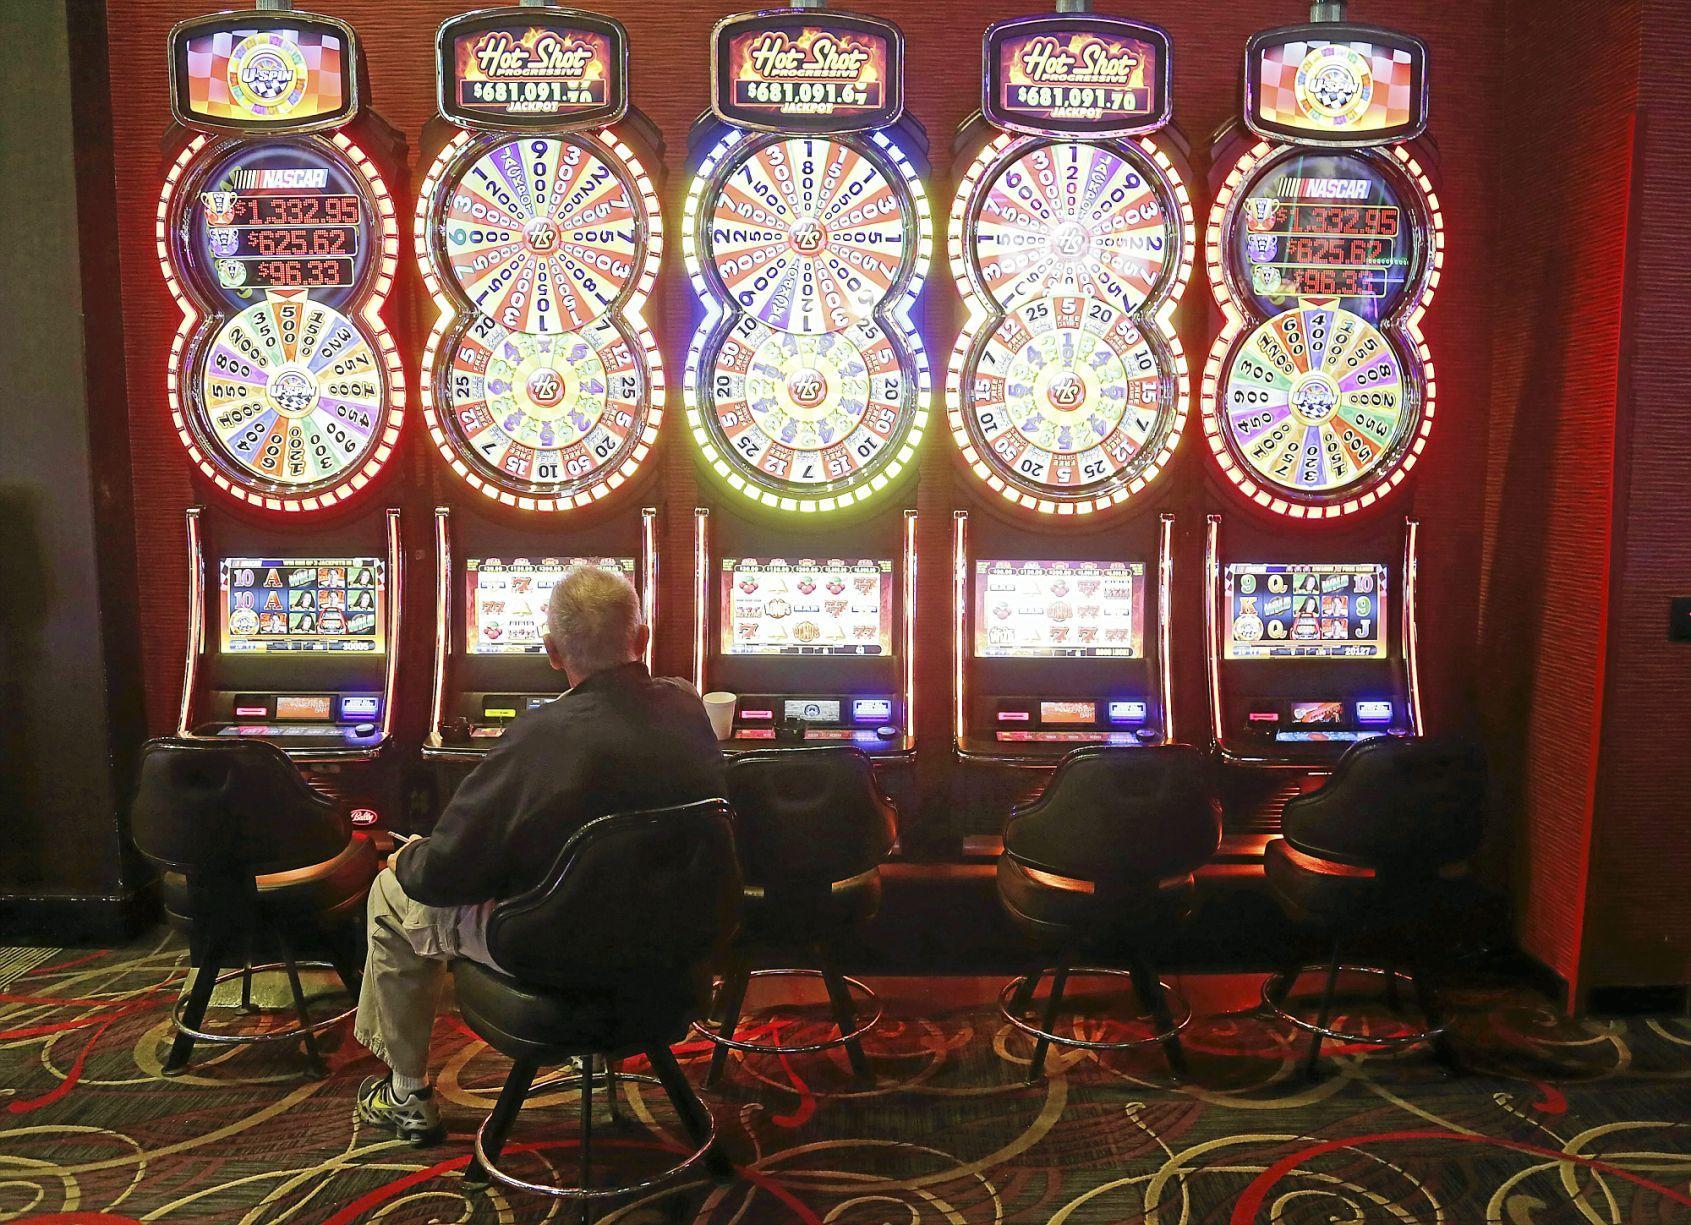 Boston seap debt counseling of casino gambling cash casino play